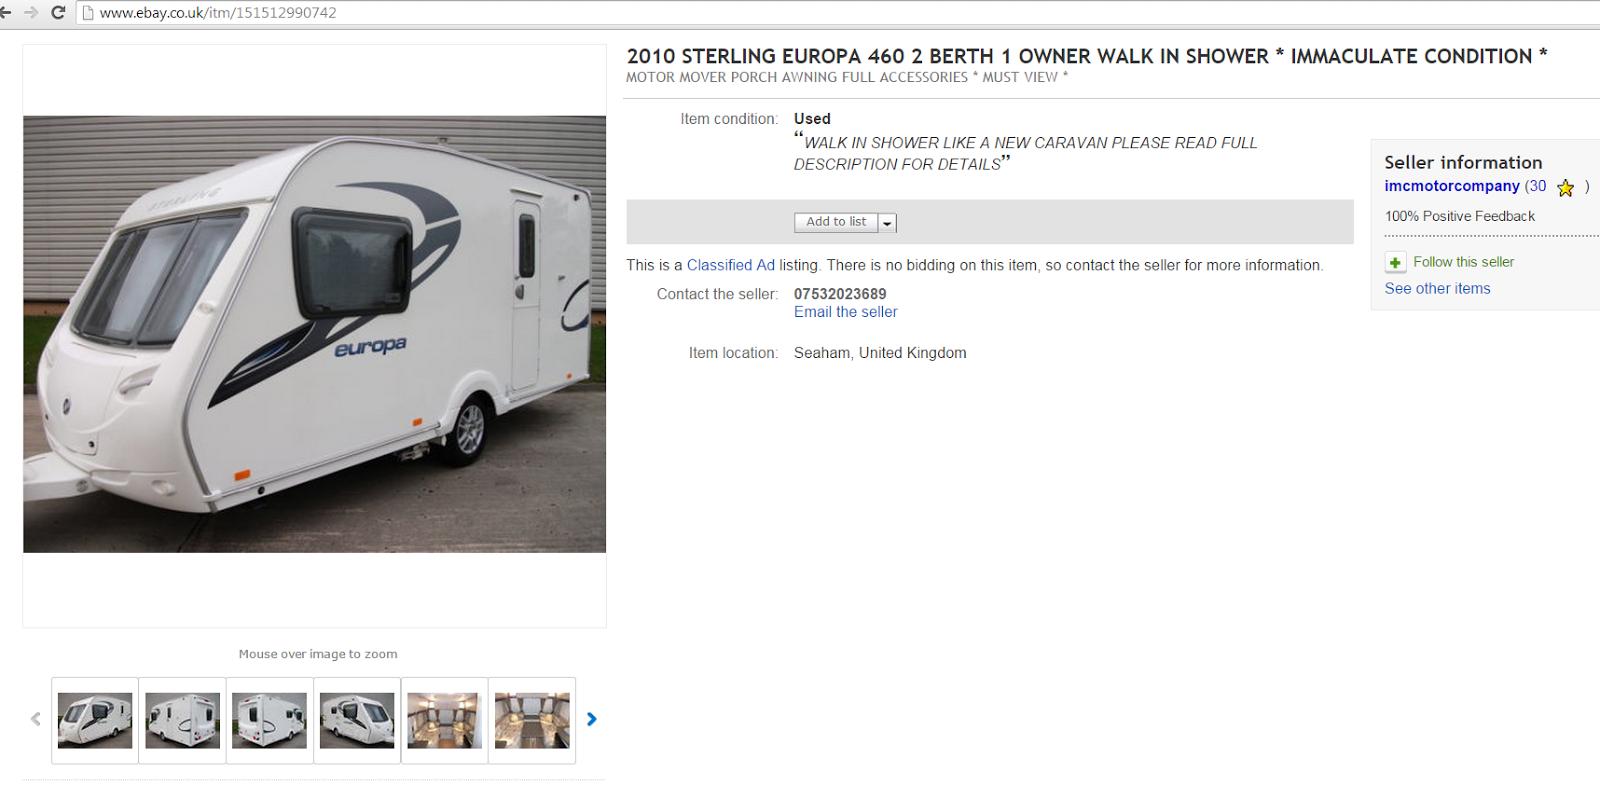 Ebay Scam Sterling Europa 460 Caravan Fraud On Ebay 03 Mar 15